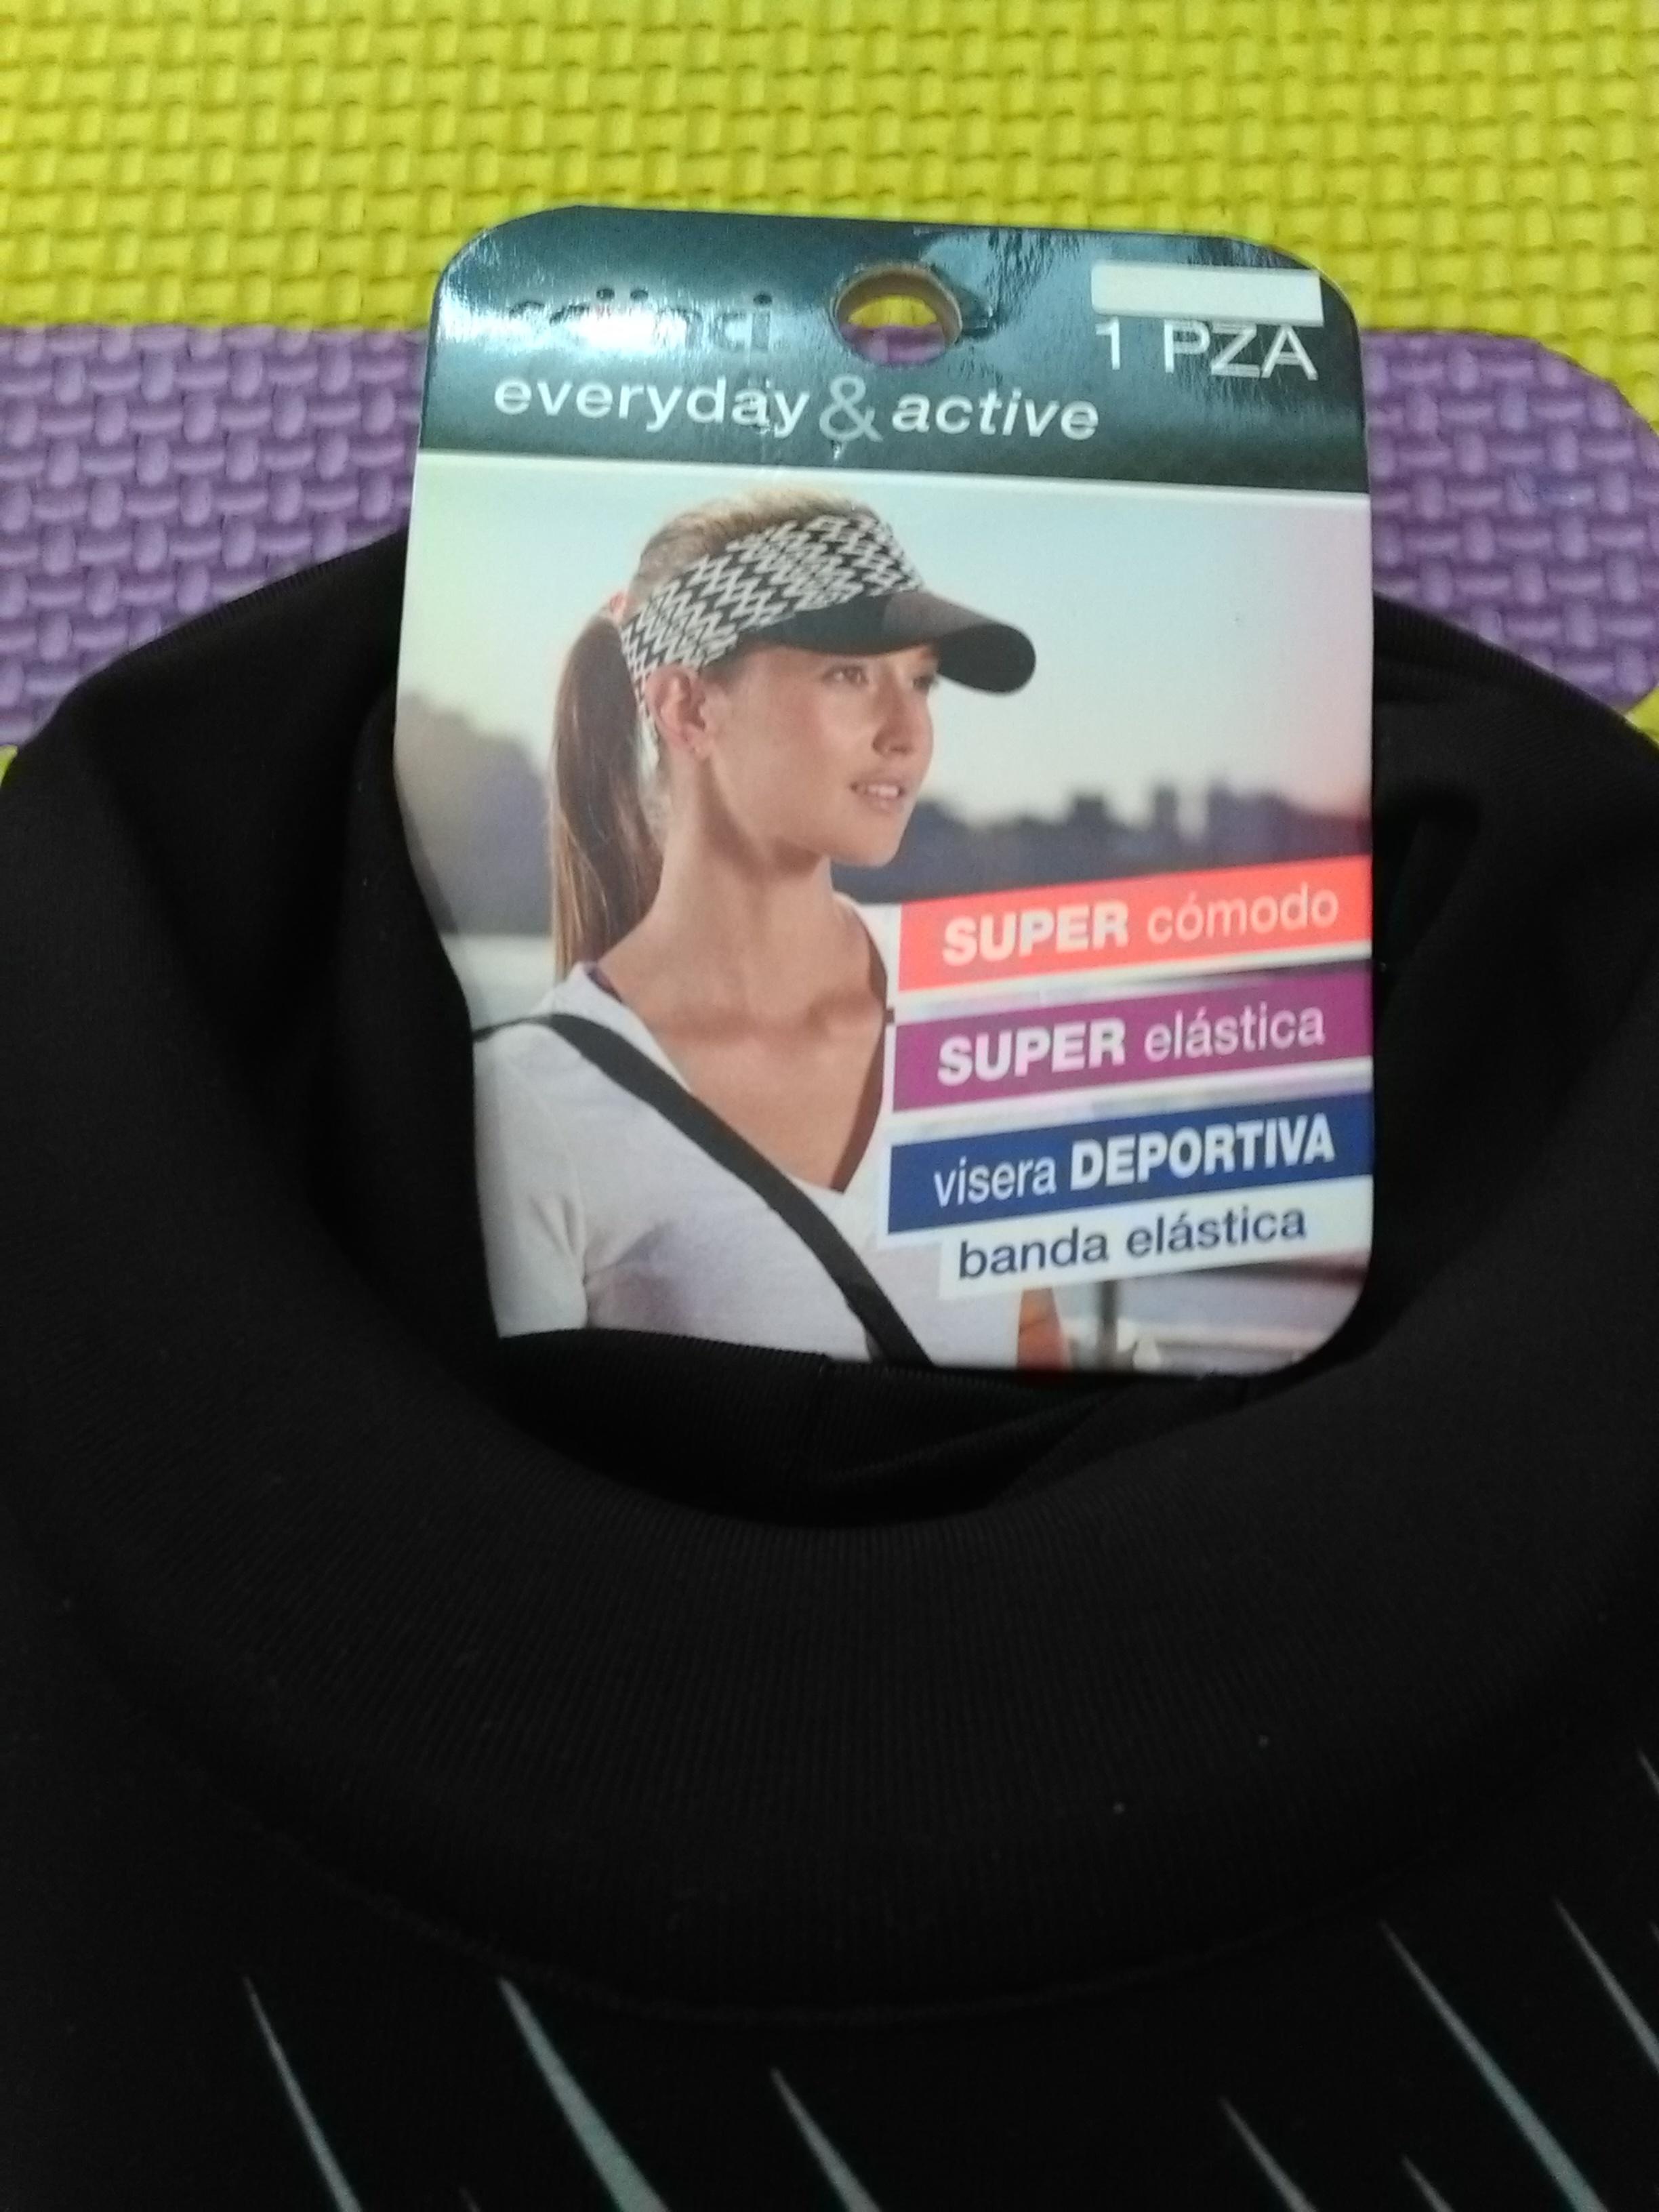 Walmart : Visera deportiva Scünci a $17.01